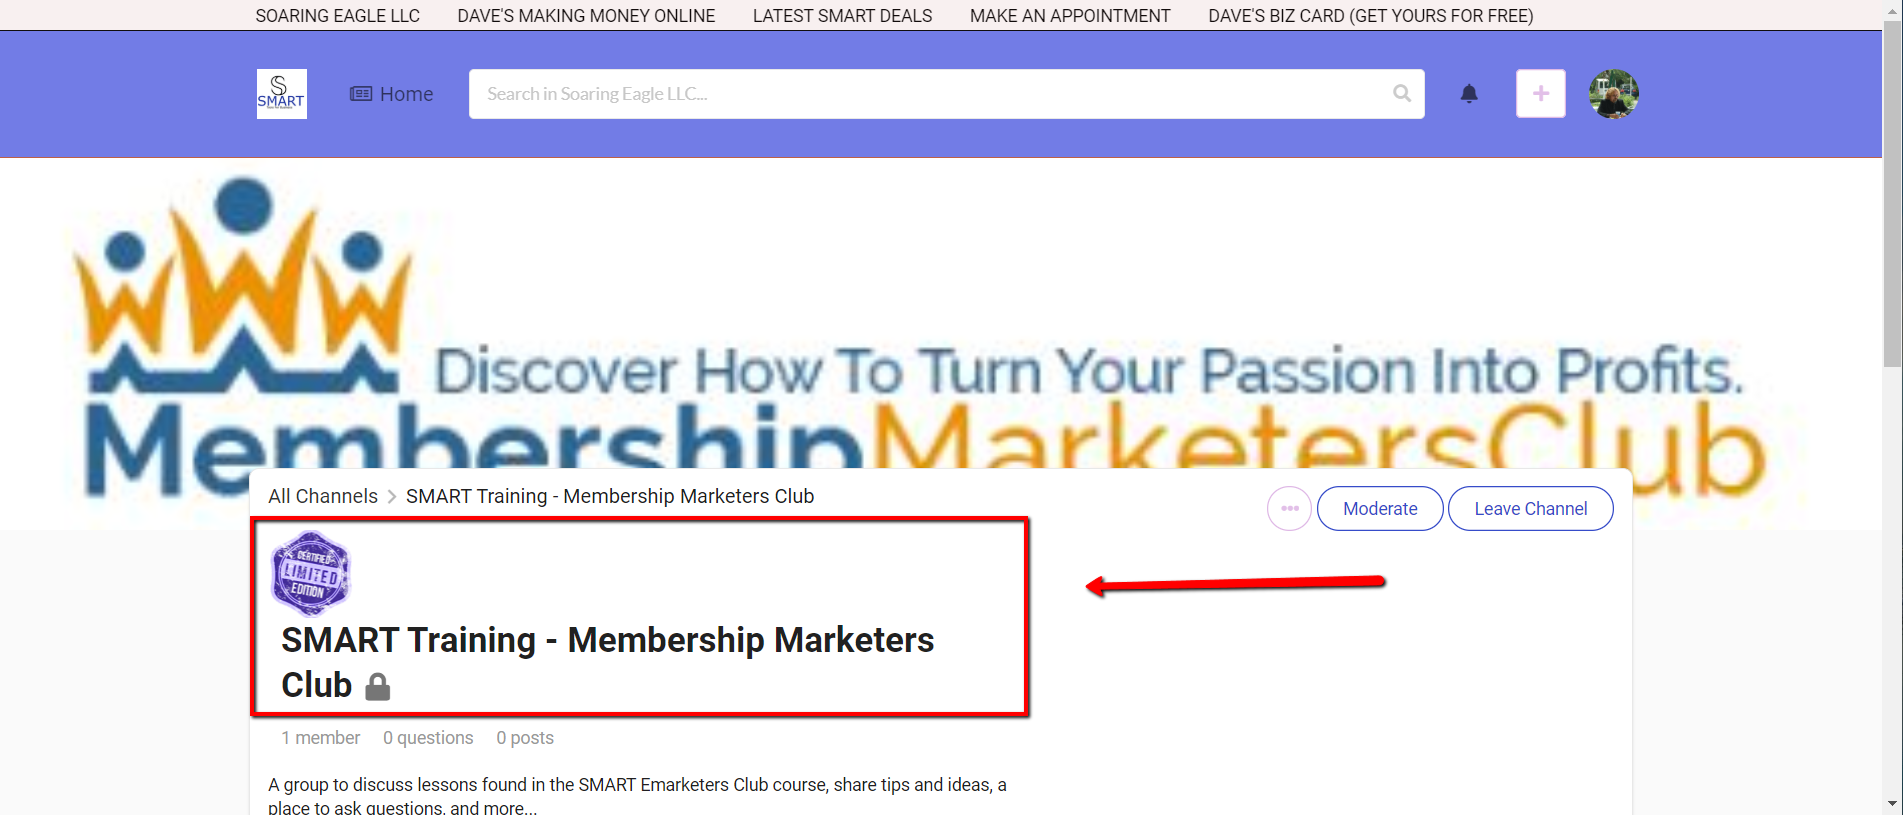 2019 12 28 1256 - SMART Training - Membership Marketers Club - 4 Simple Steps To Membership Profits